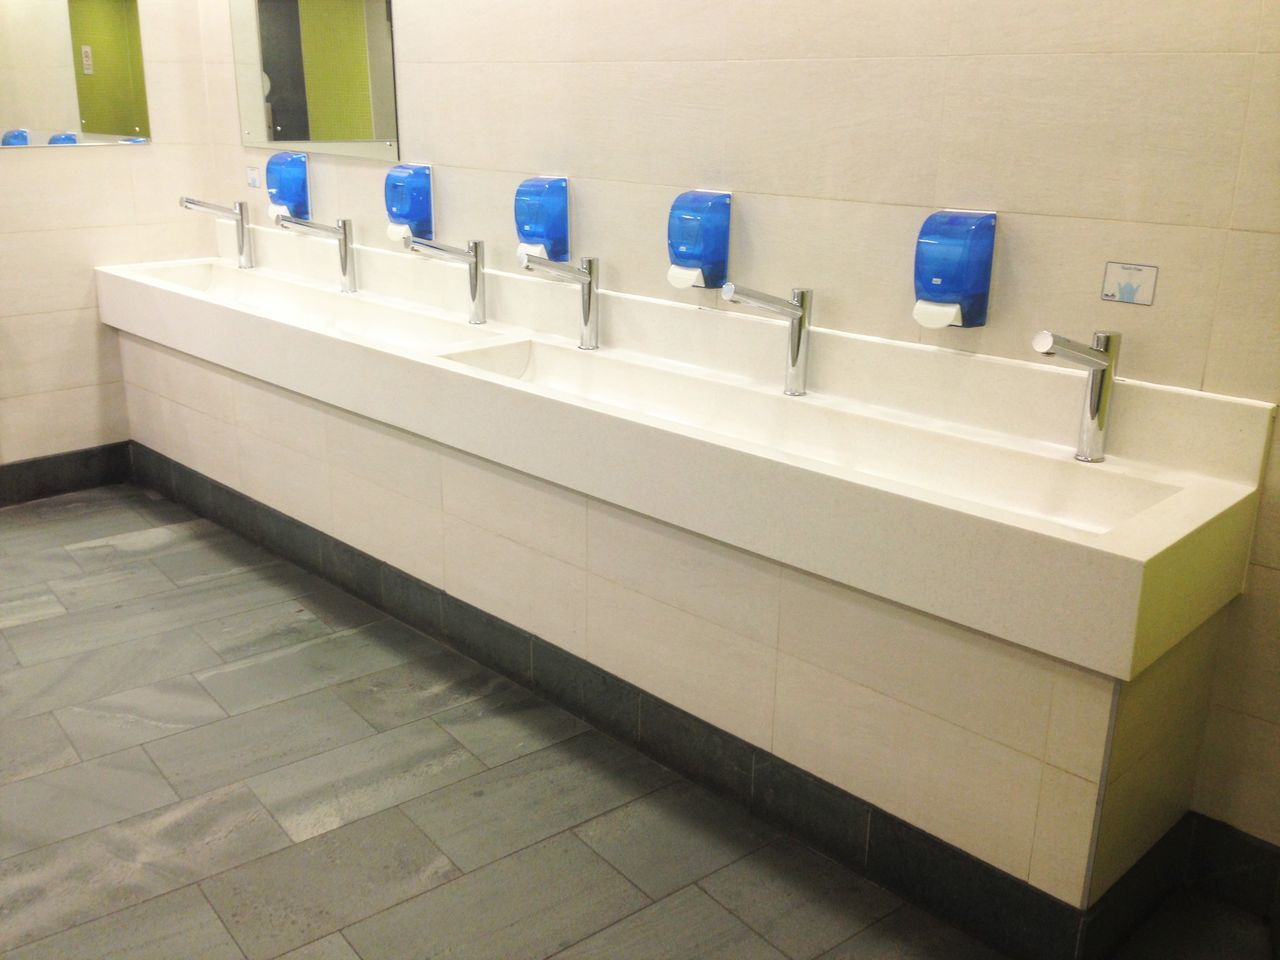 Mirror Sink Sinks Soap Soap Dispenser Tap Taps Tiles Washroom